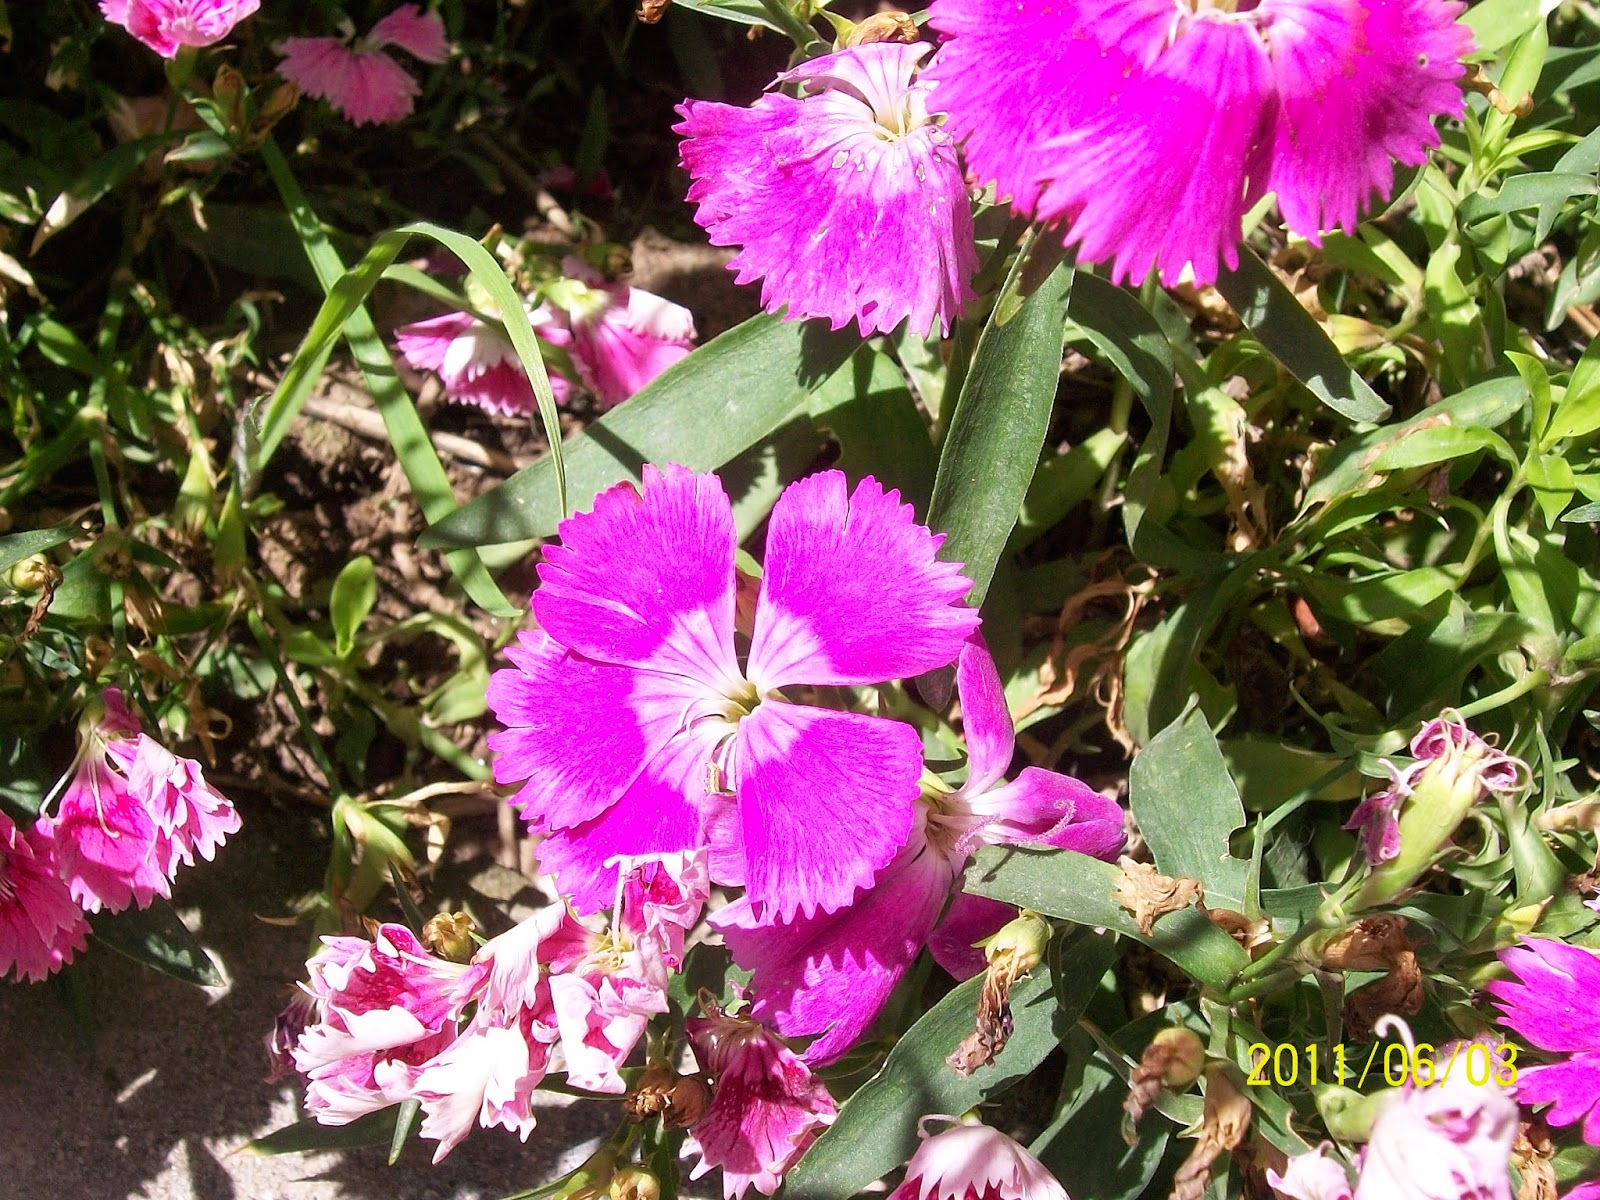 Manali Flowers